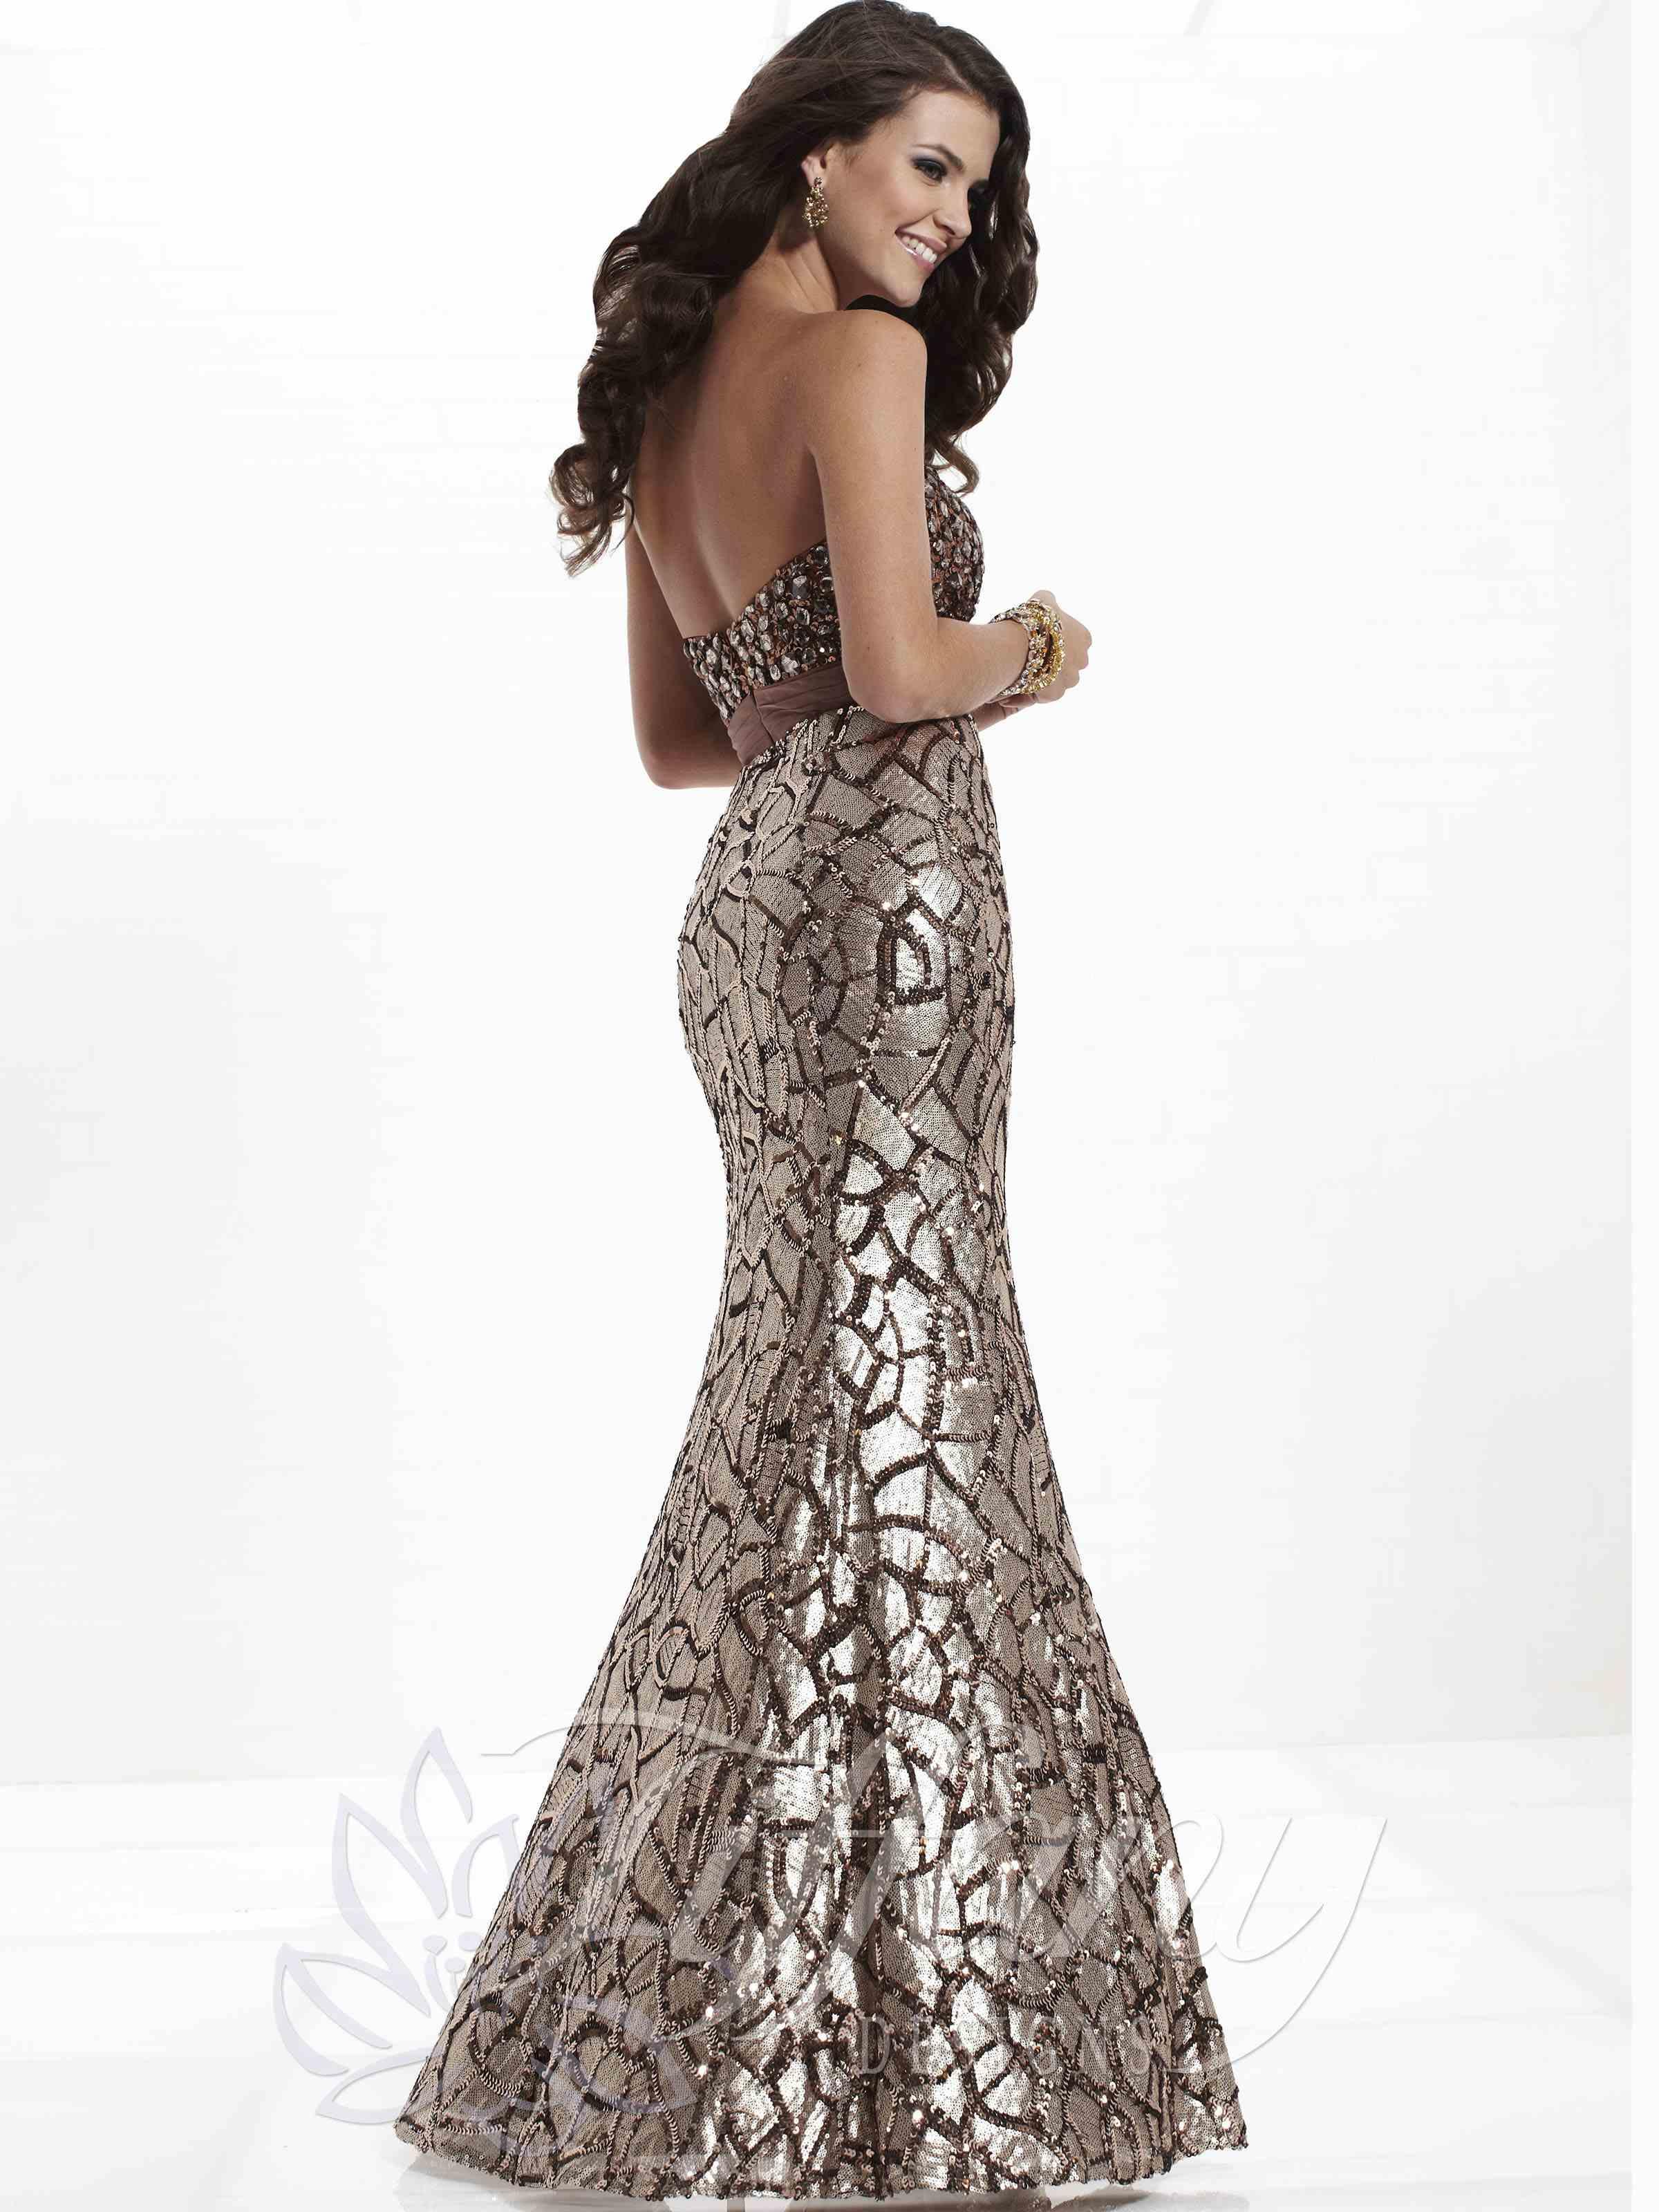 edgy prom dresses - photo #7